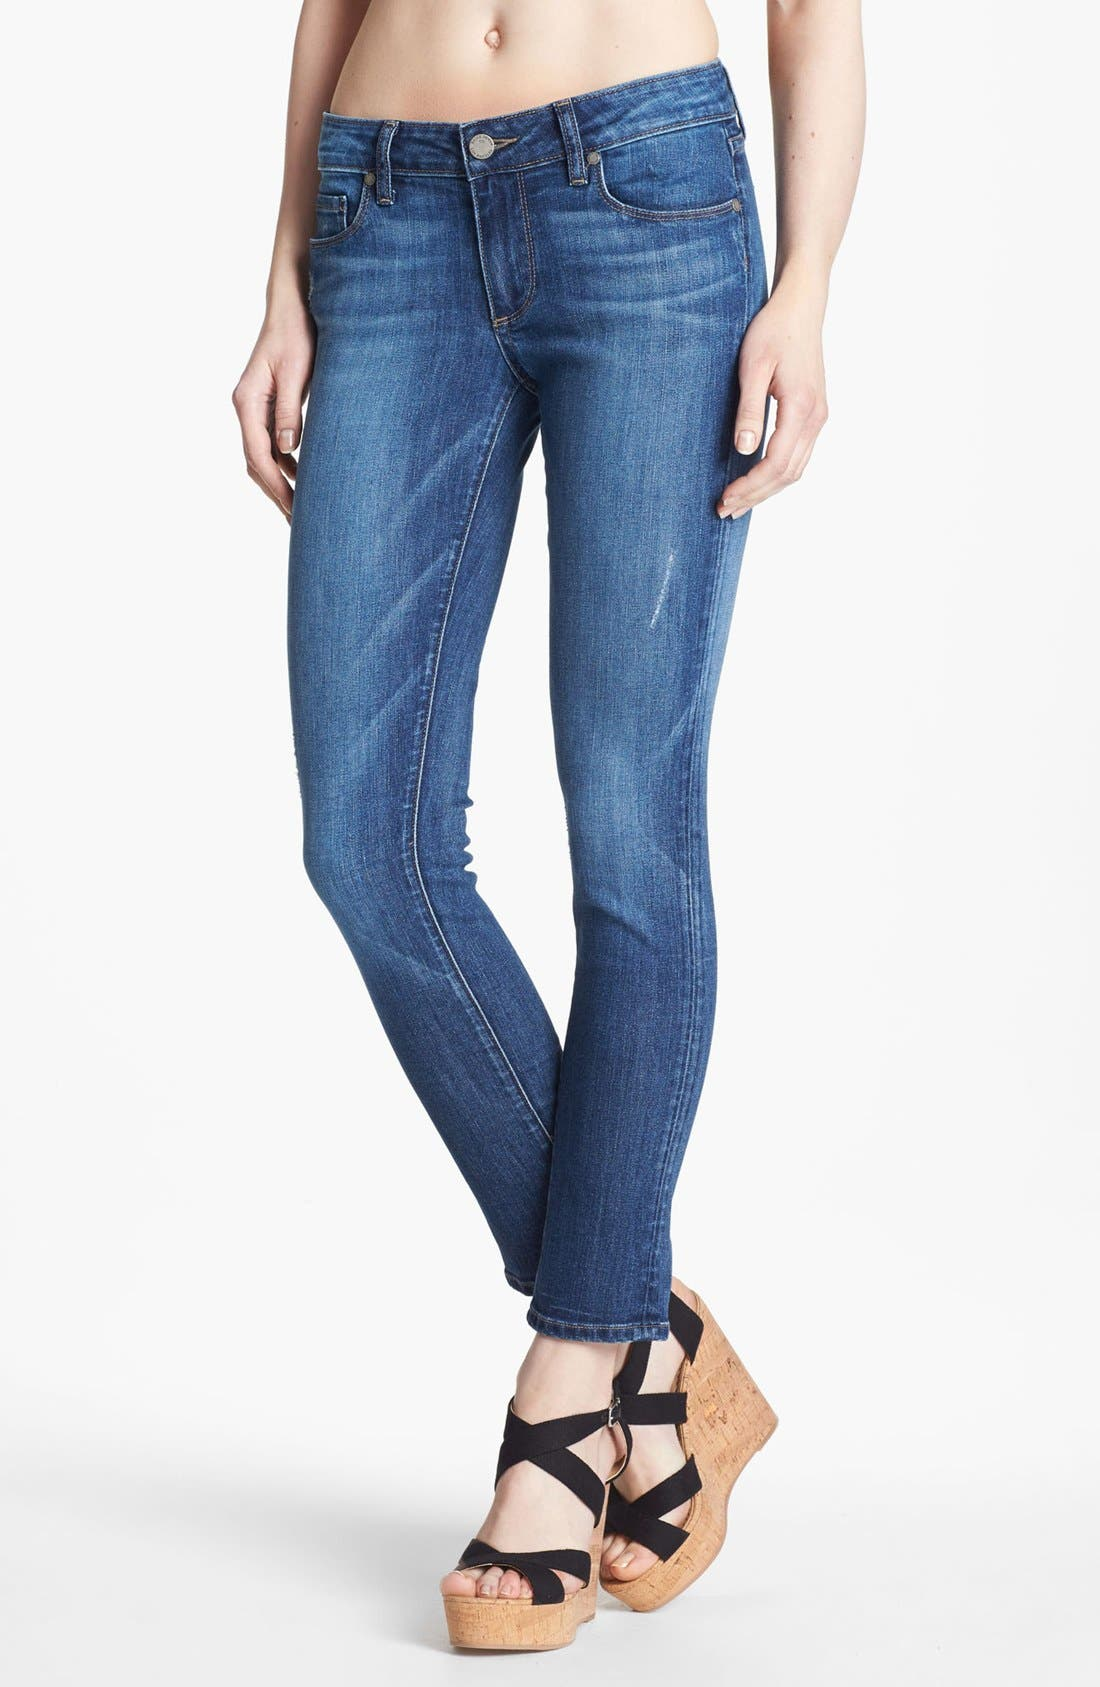 Alternate Image 1 Selected - Paige Denim 'Skyline' Ankle Peg Skinny Stretch Jeans (Penelope)